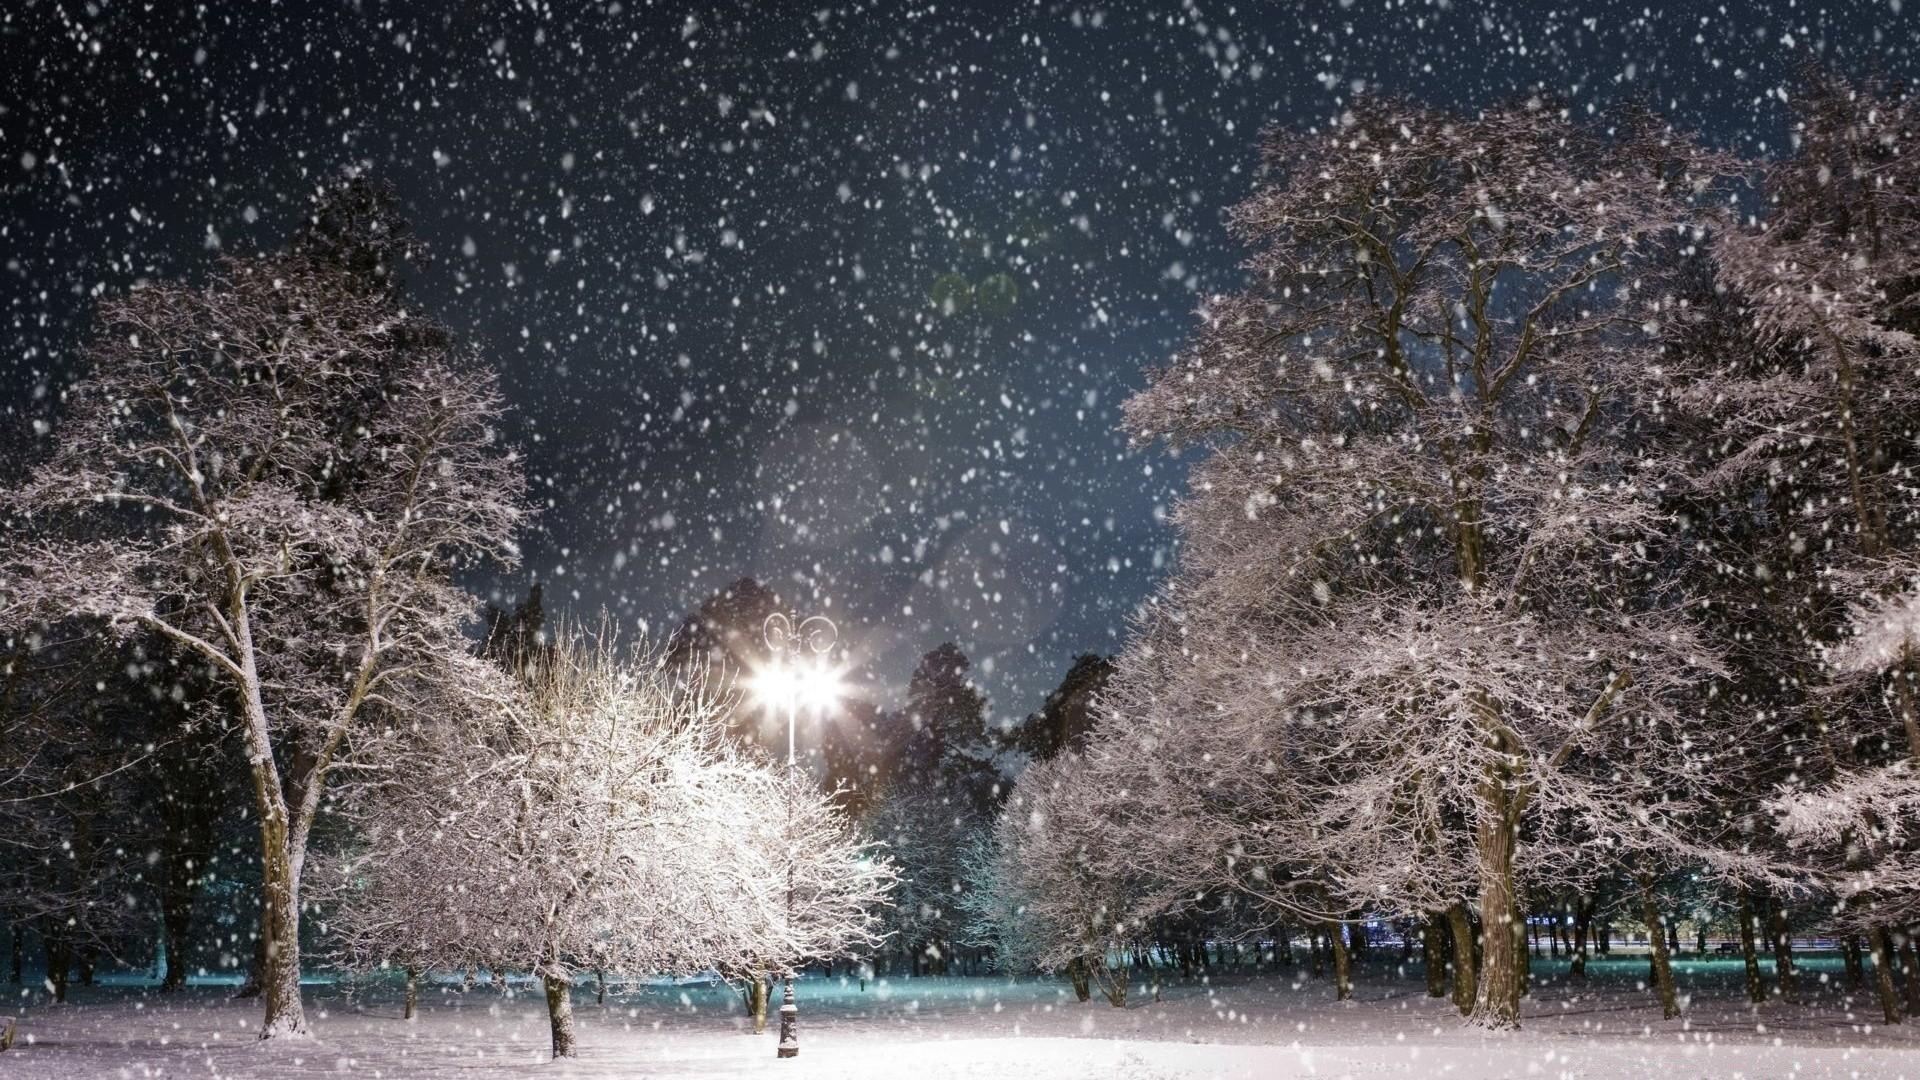 Фото на рабочий стол снегопад